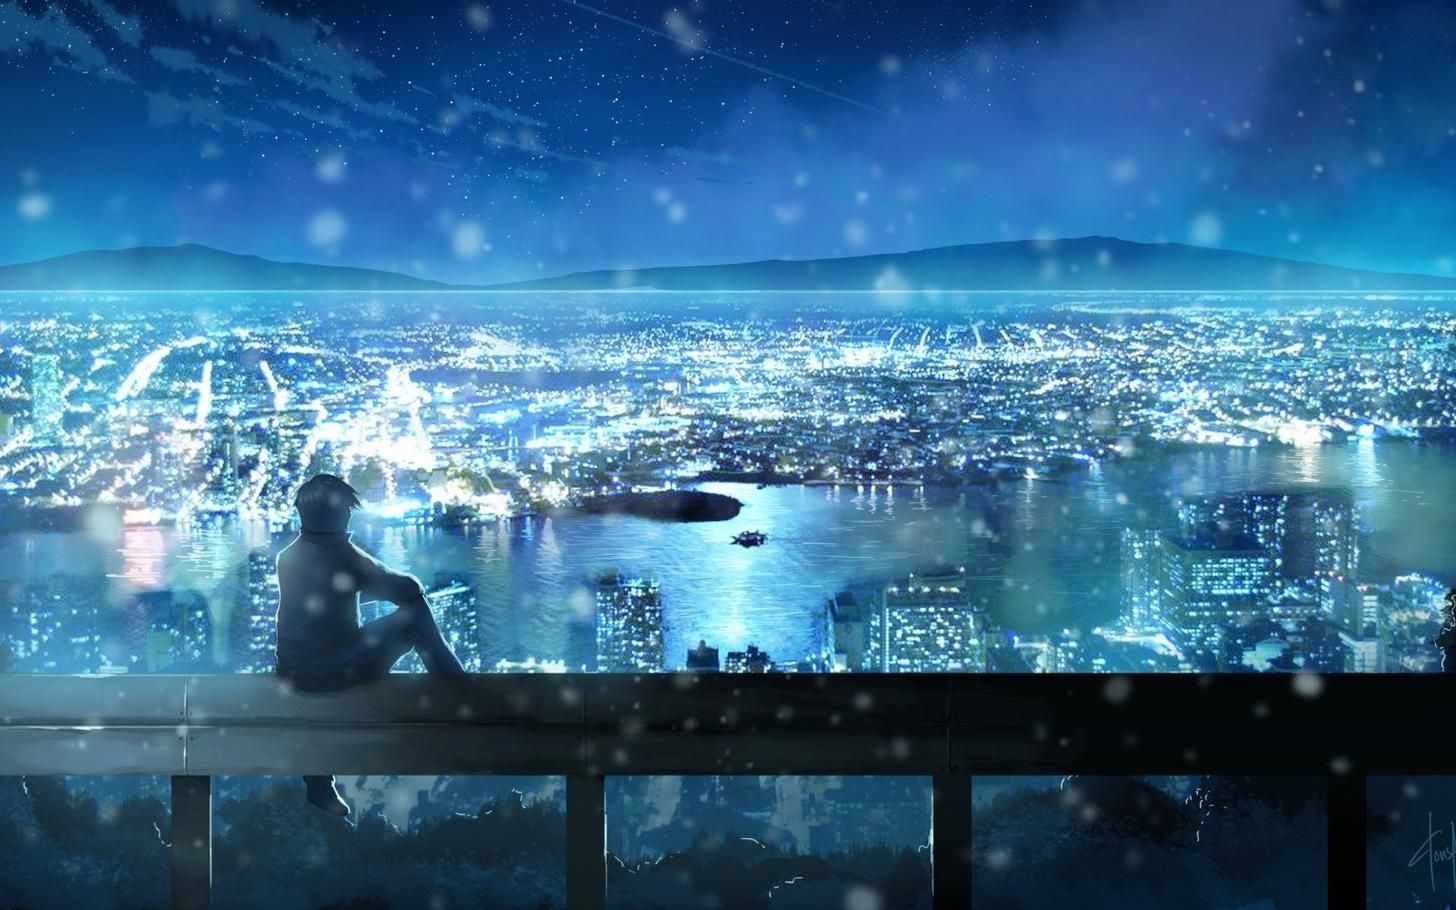 Anime Boy Sitting On Bridge Anime Scenery Anime Scenery Wallpaper Anime City